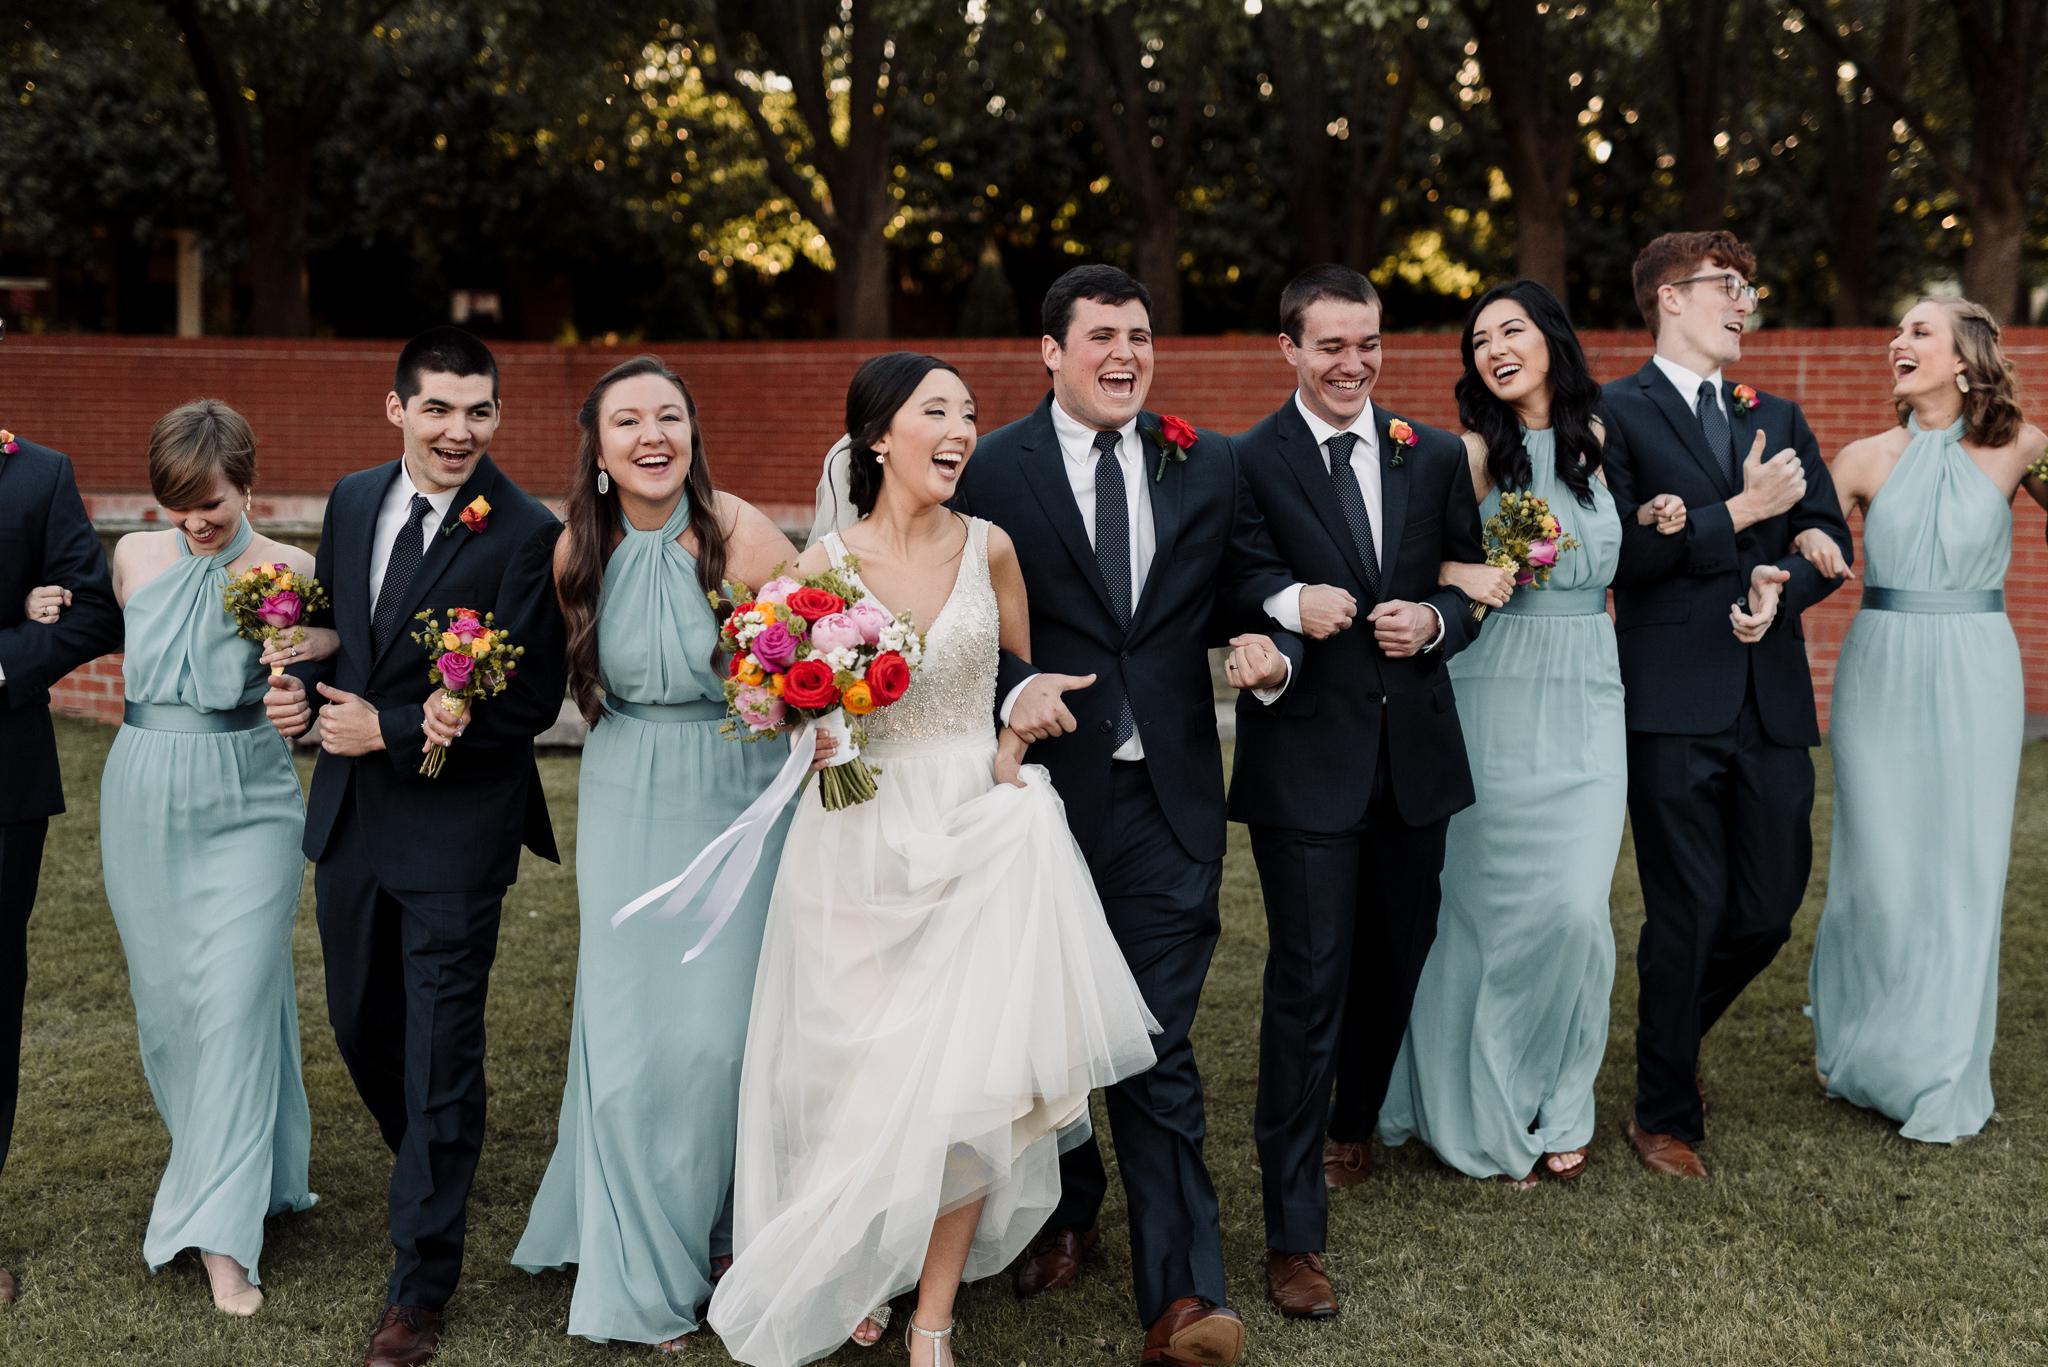 Oklahoma-Christian-University-Wedding-8549.jpg